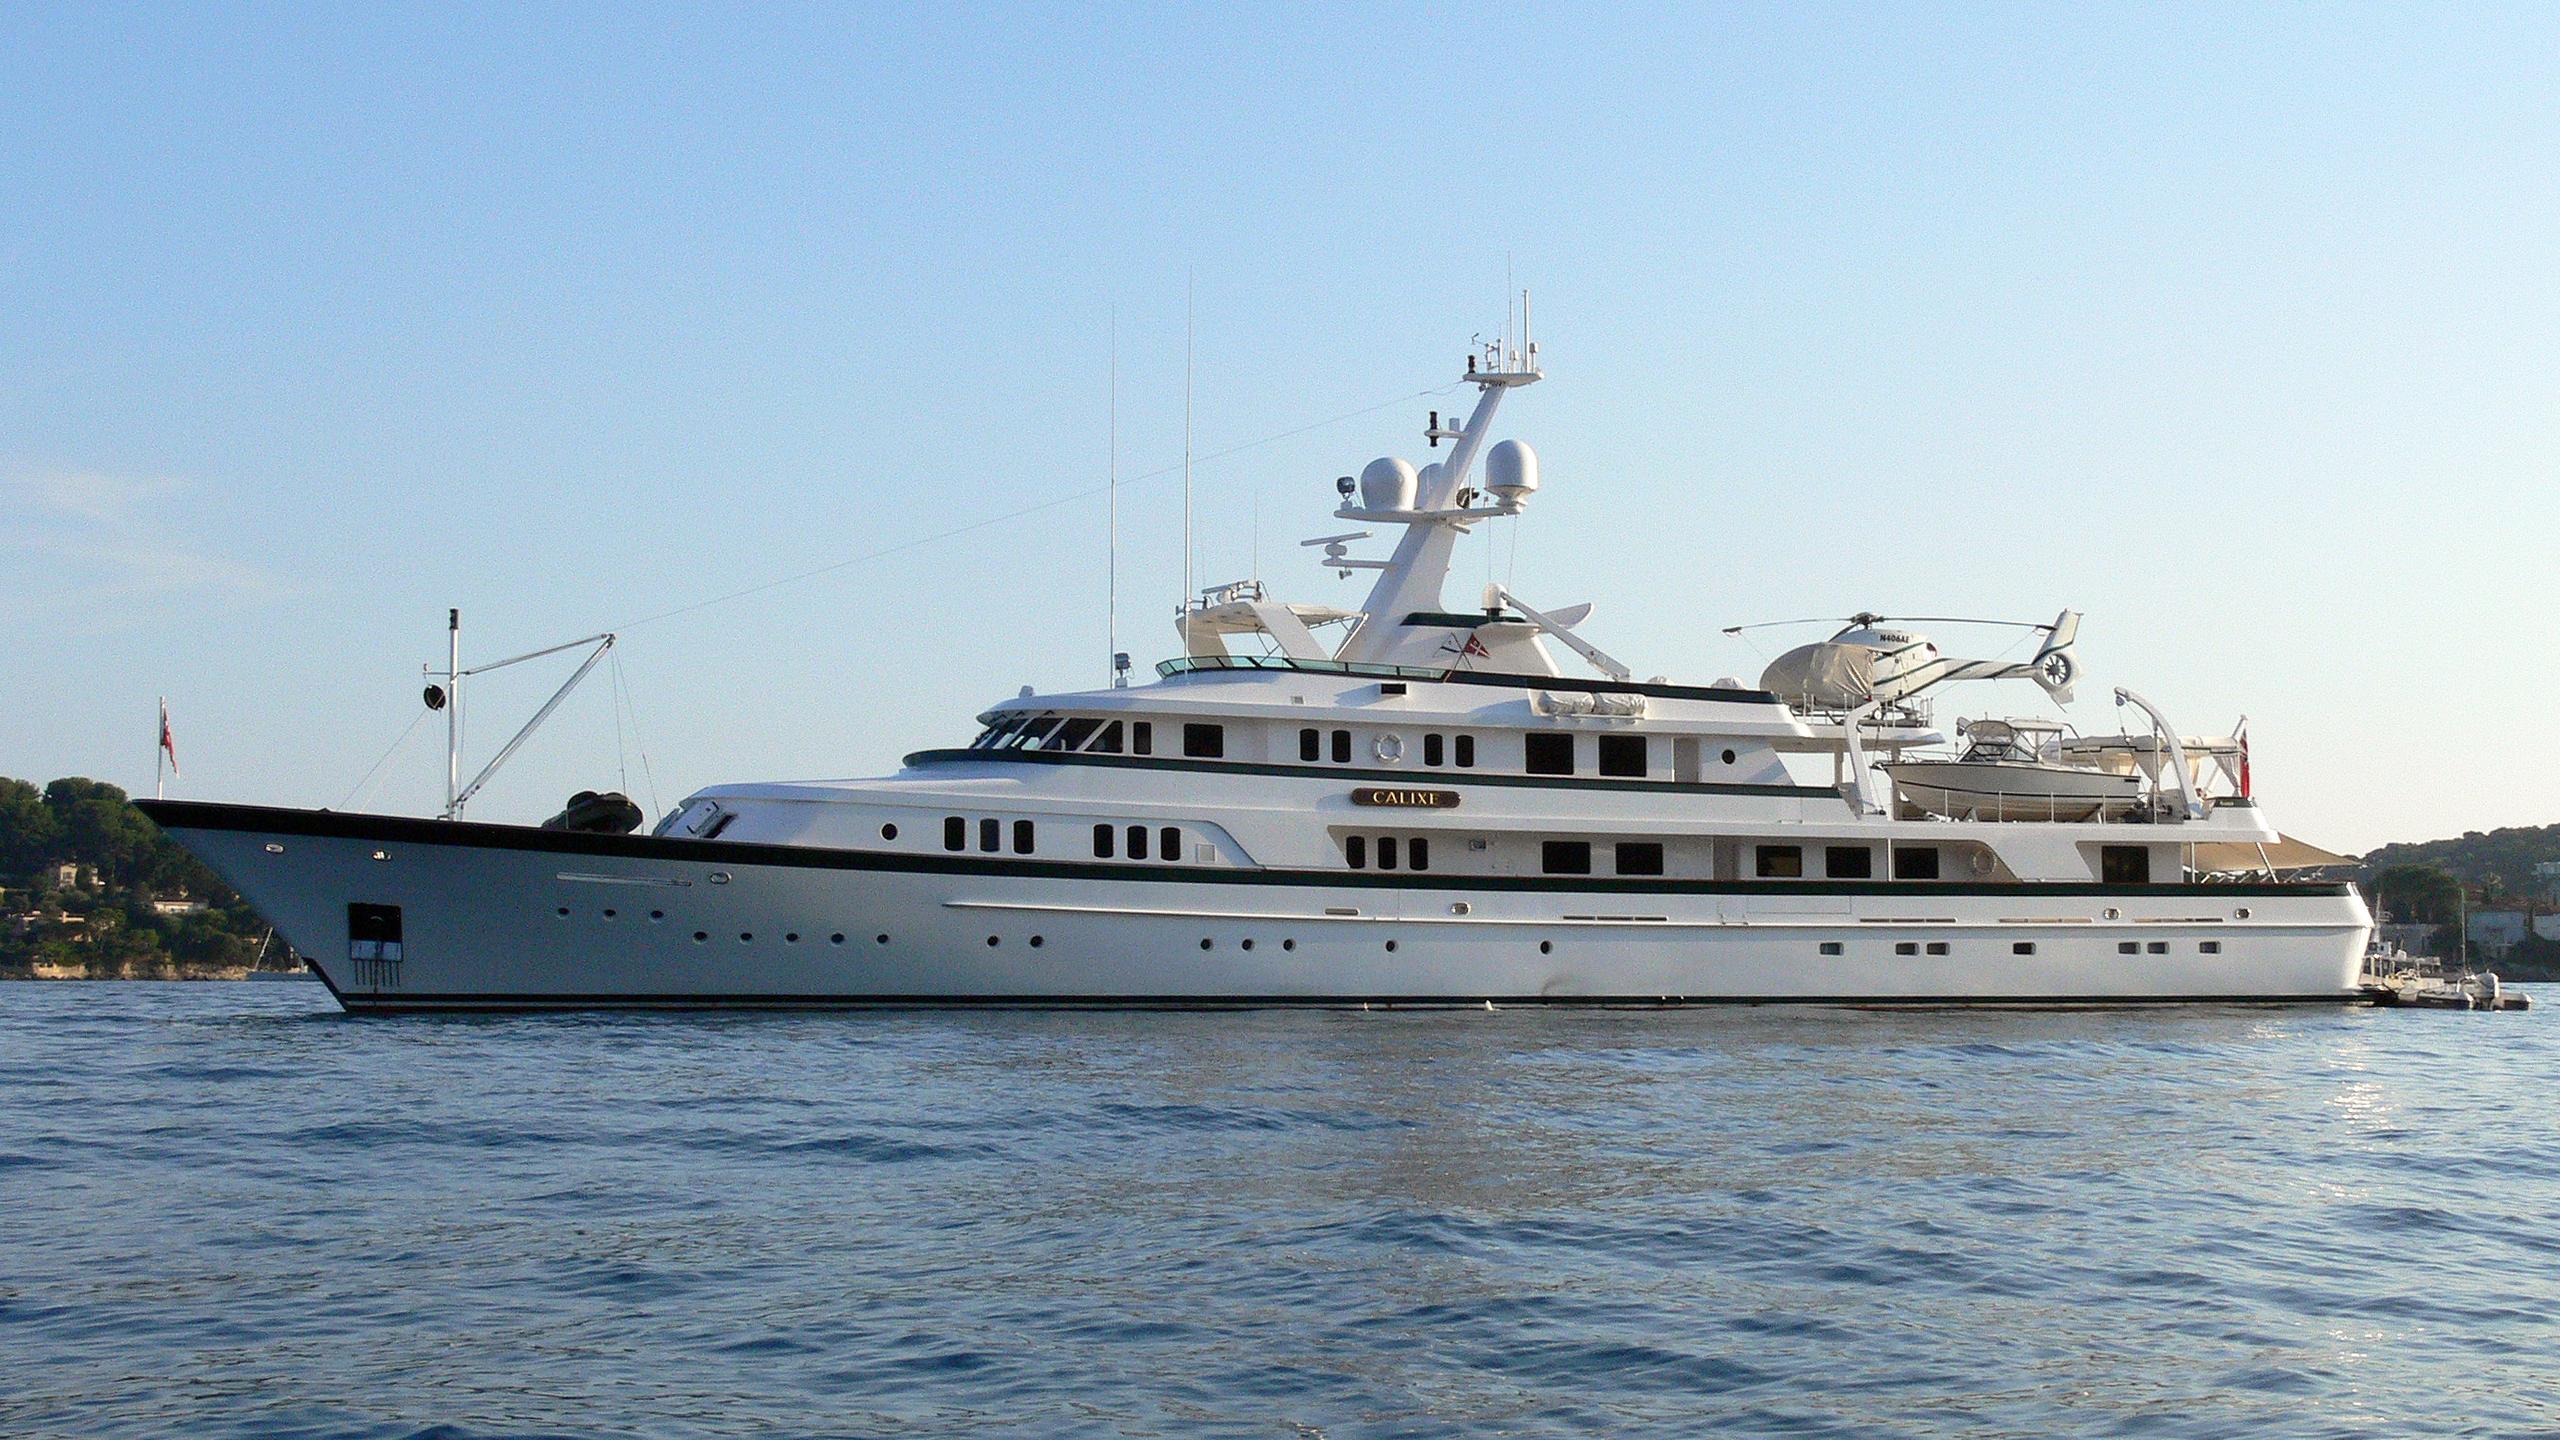 minderella-motor-yacht-feadship-1986-59m-profile